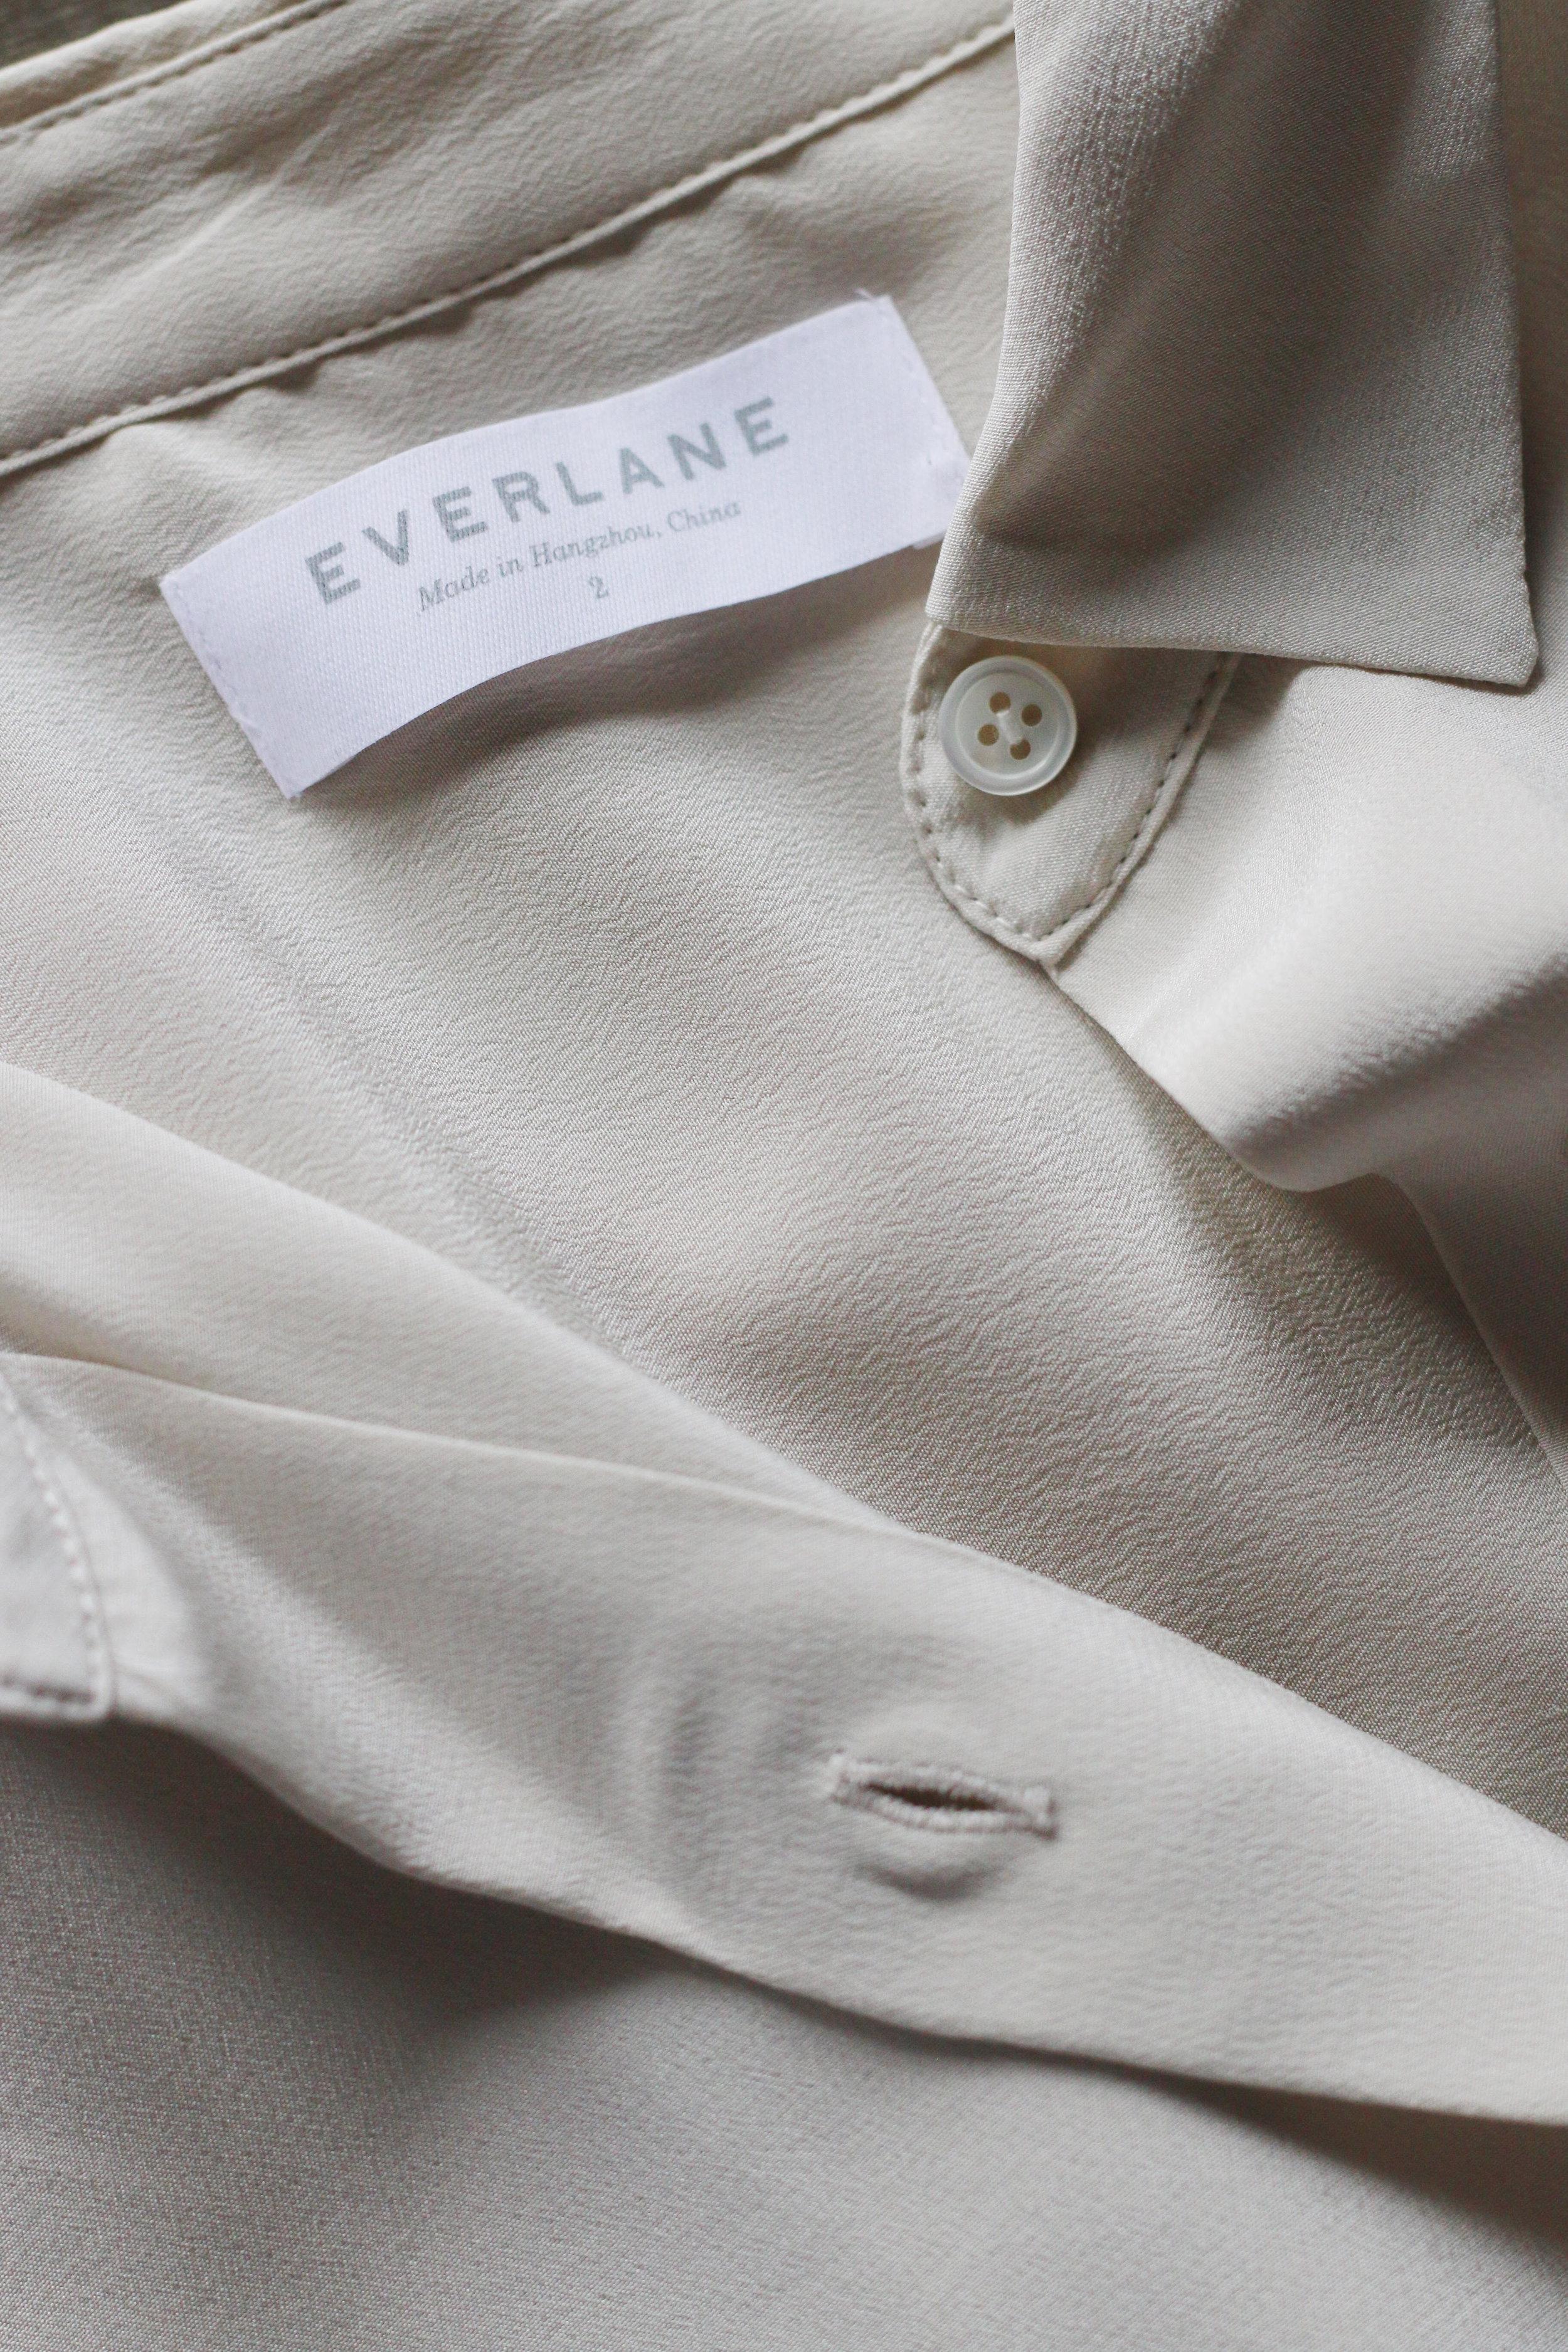 everlane shirt.jpg